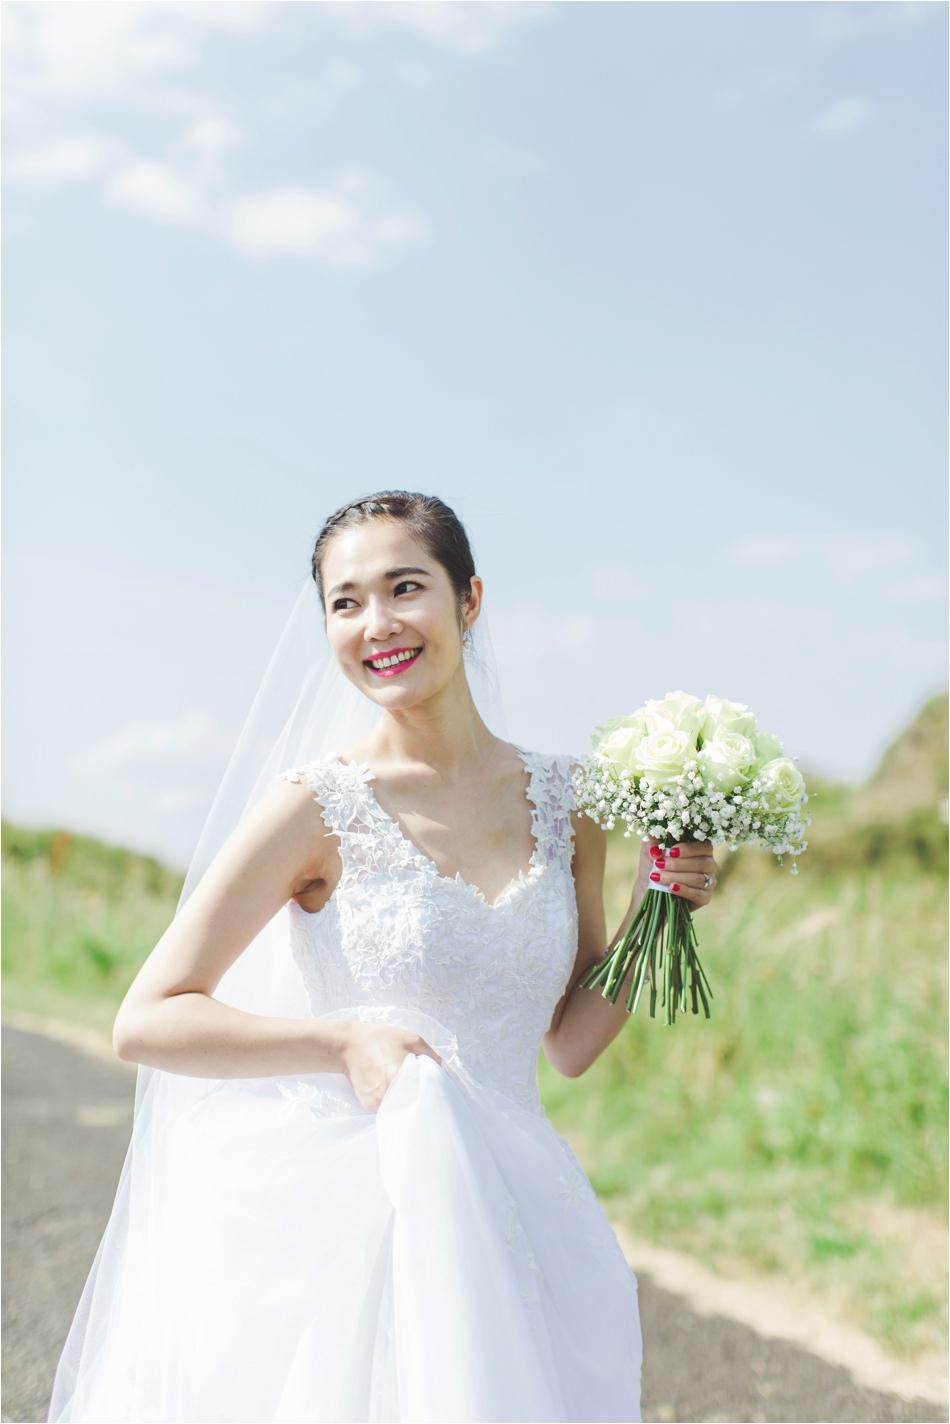 fine art wedding photographers scotland glasgow 7-1.jpg